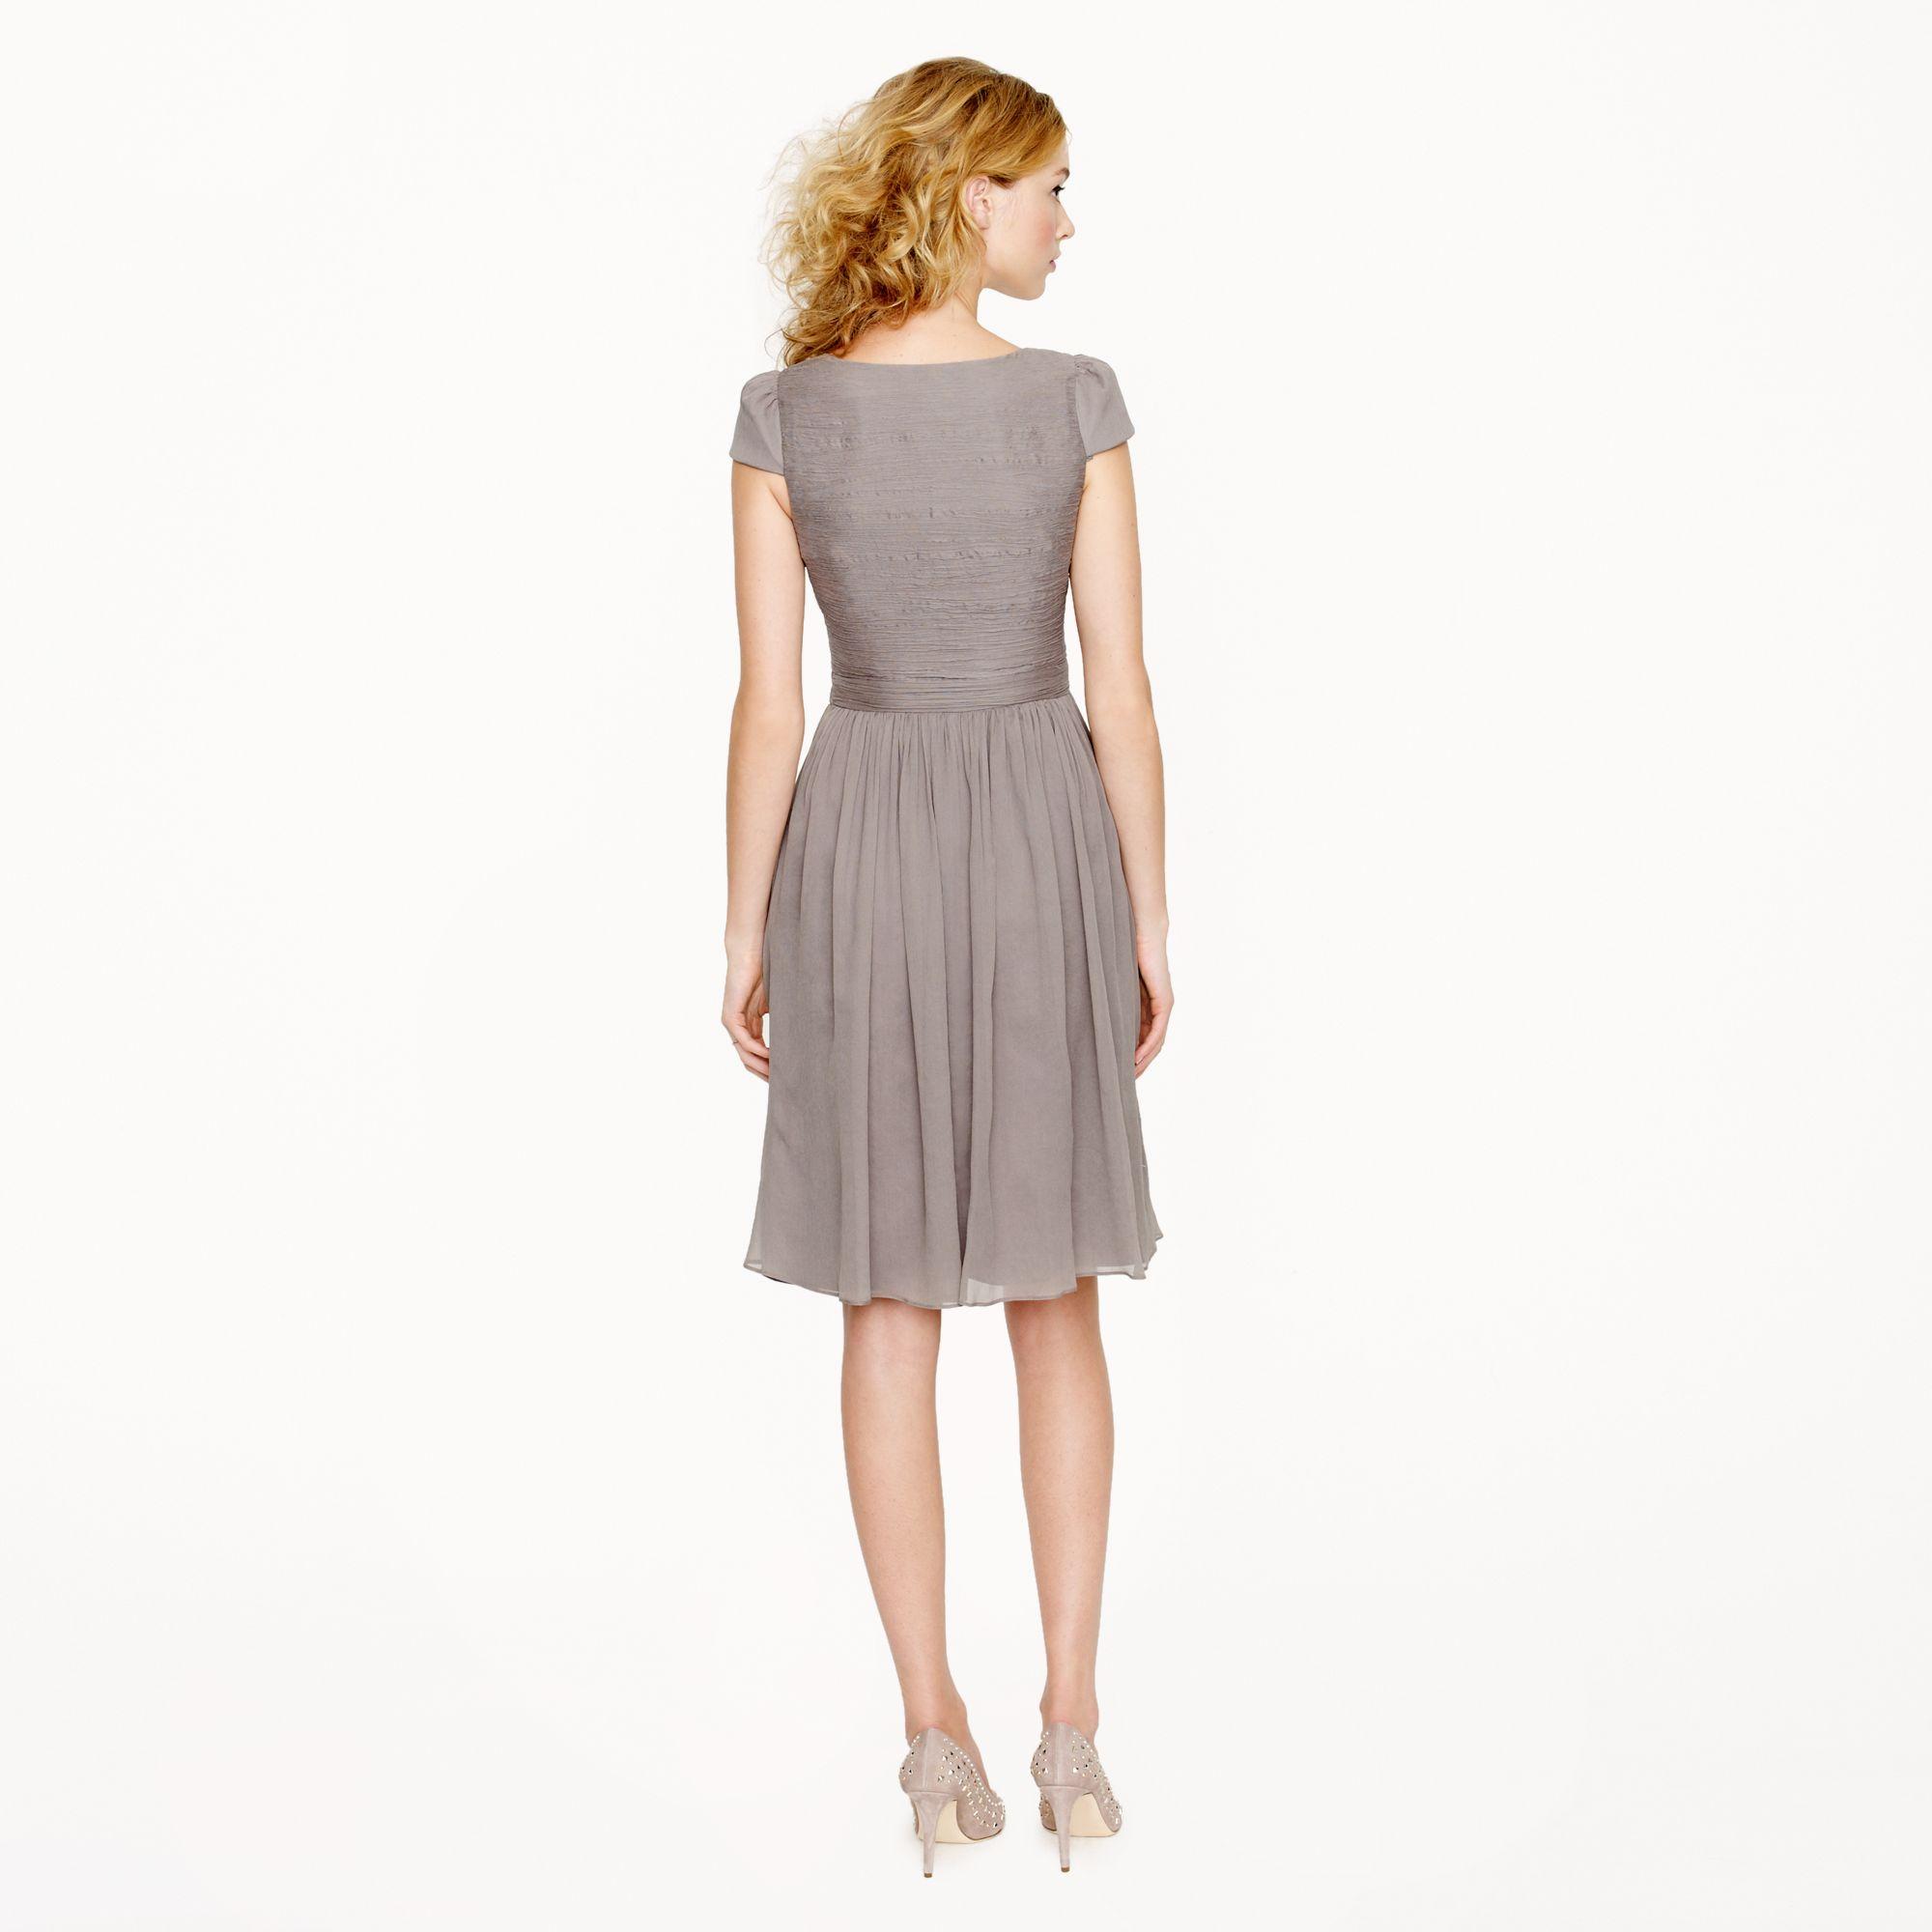 J Crew Mirabelle Dress In Silk Chiffon In Gray Graphite